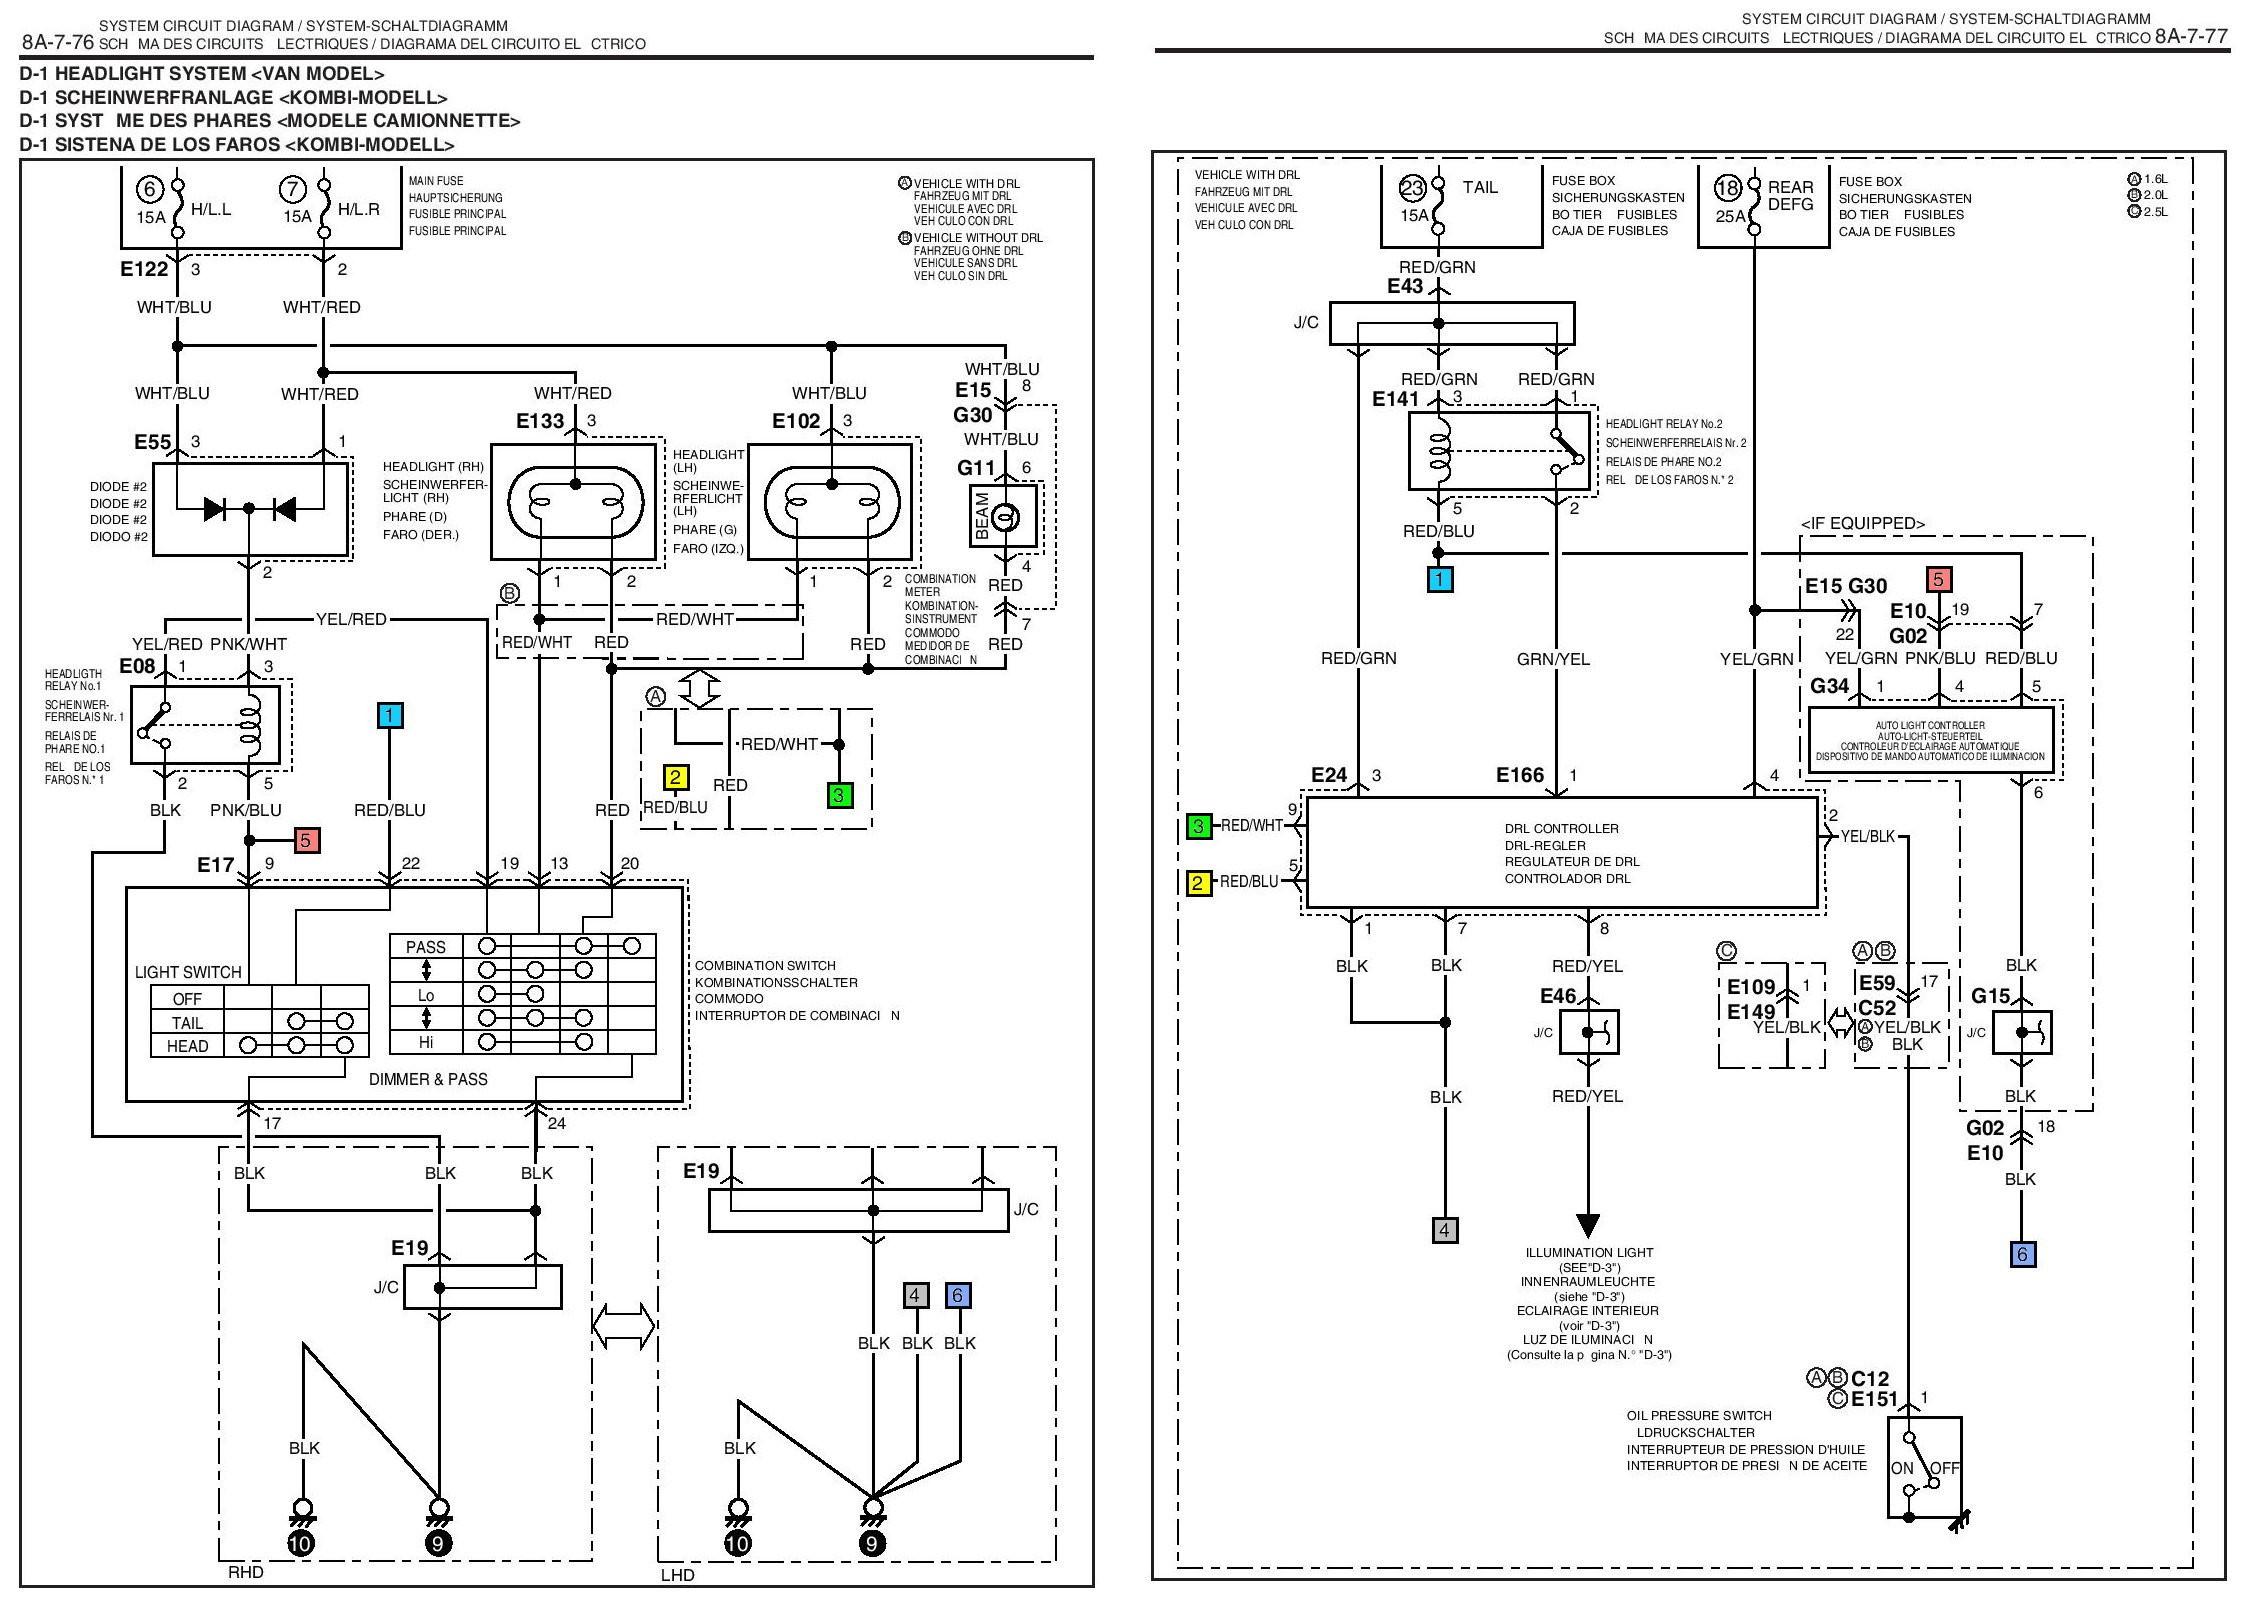 suzuki grand vitara exhaust system diagram wiring schematics diagram rh enr  green com 2000 Grand Vitara 2004 Grand Vitara Fog Light